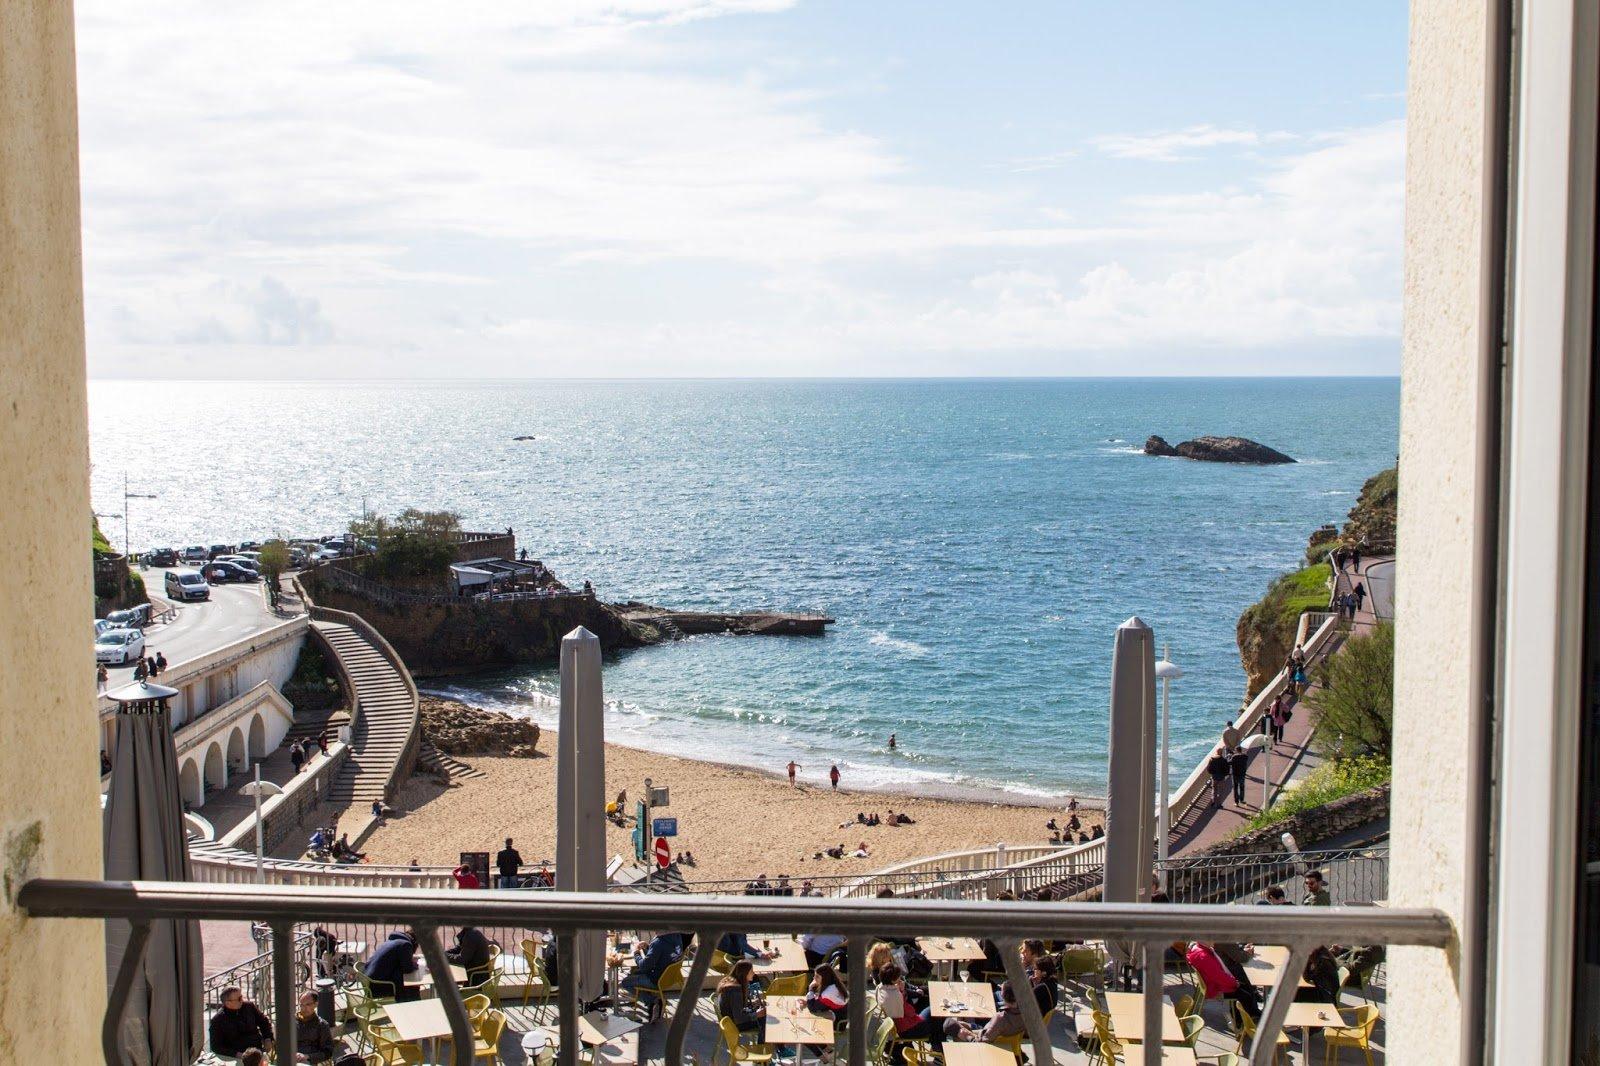 Les Baigneuses Biarritz vue